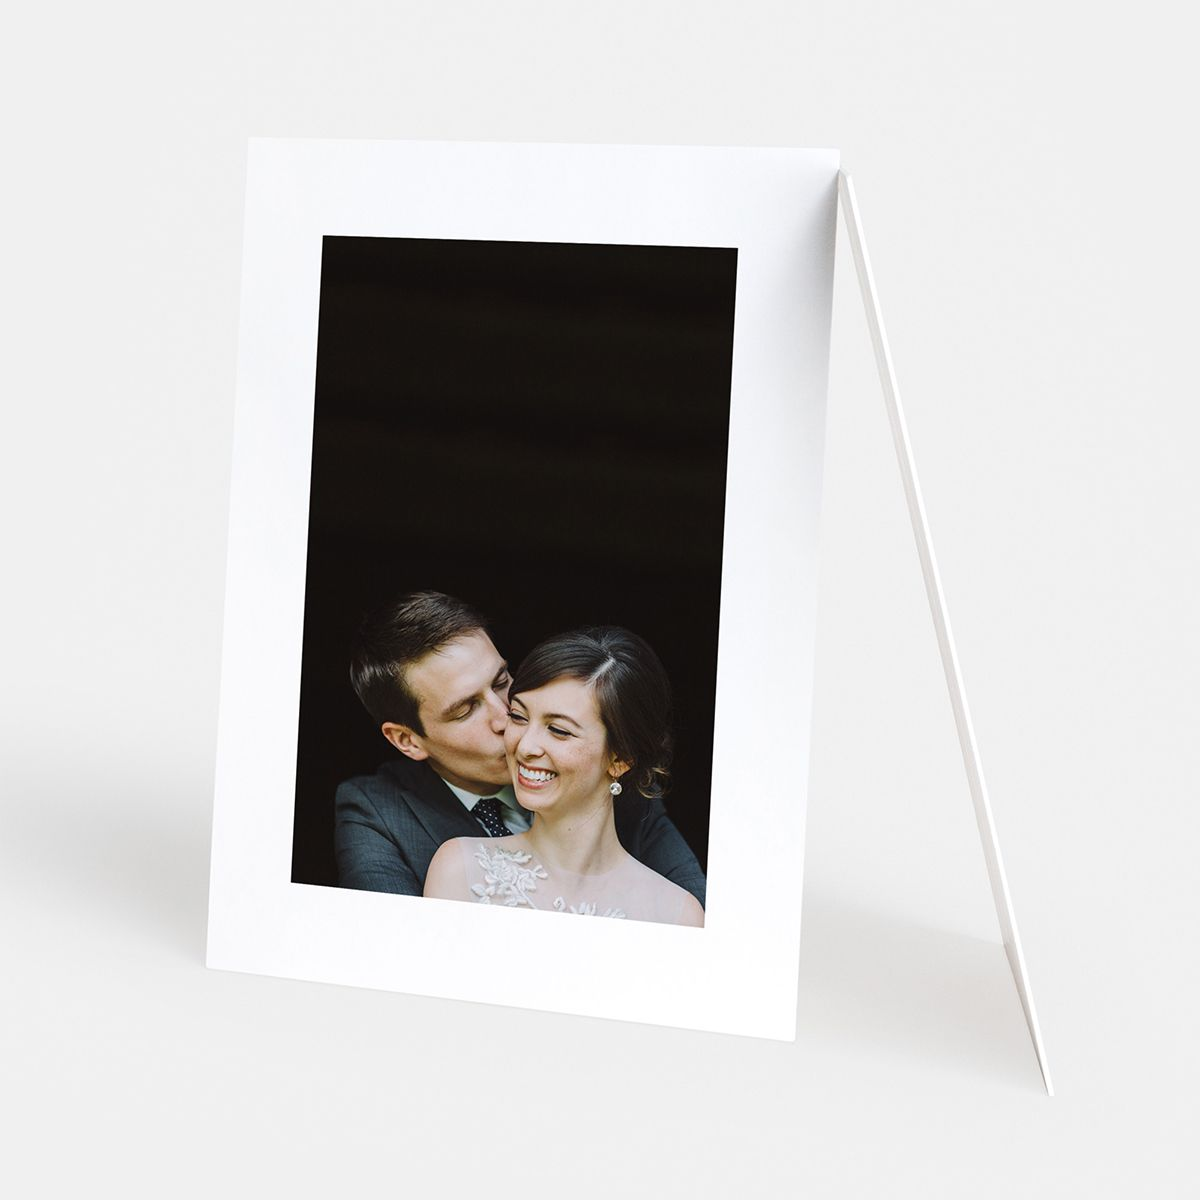 signature-prints-card-main01-couple-black-background_2x.jpg